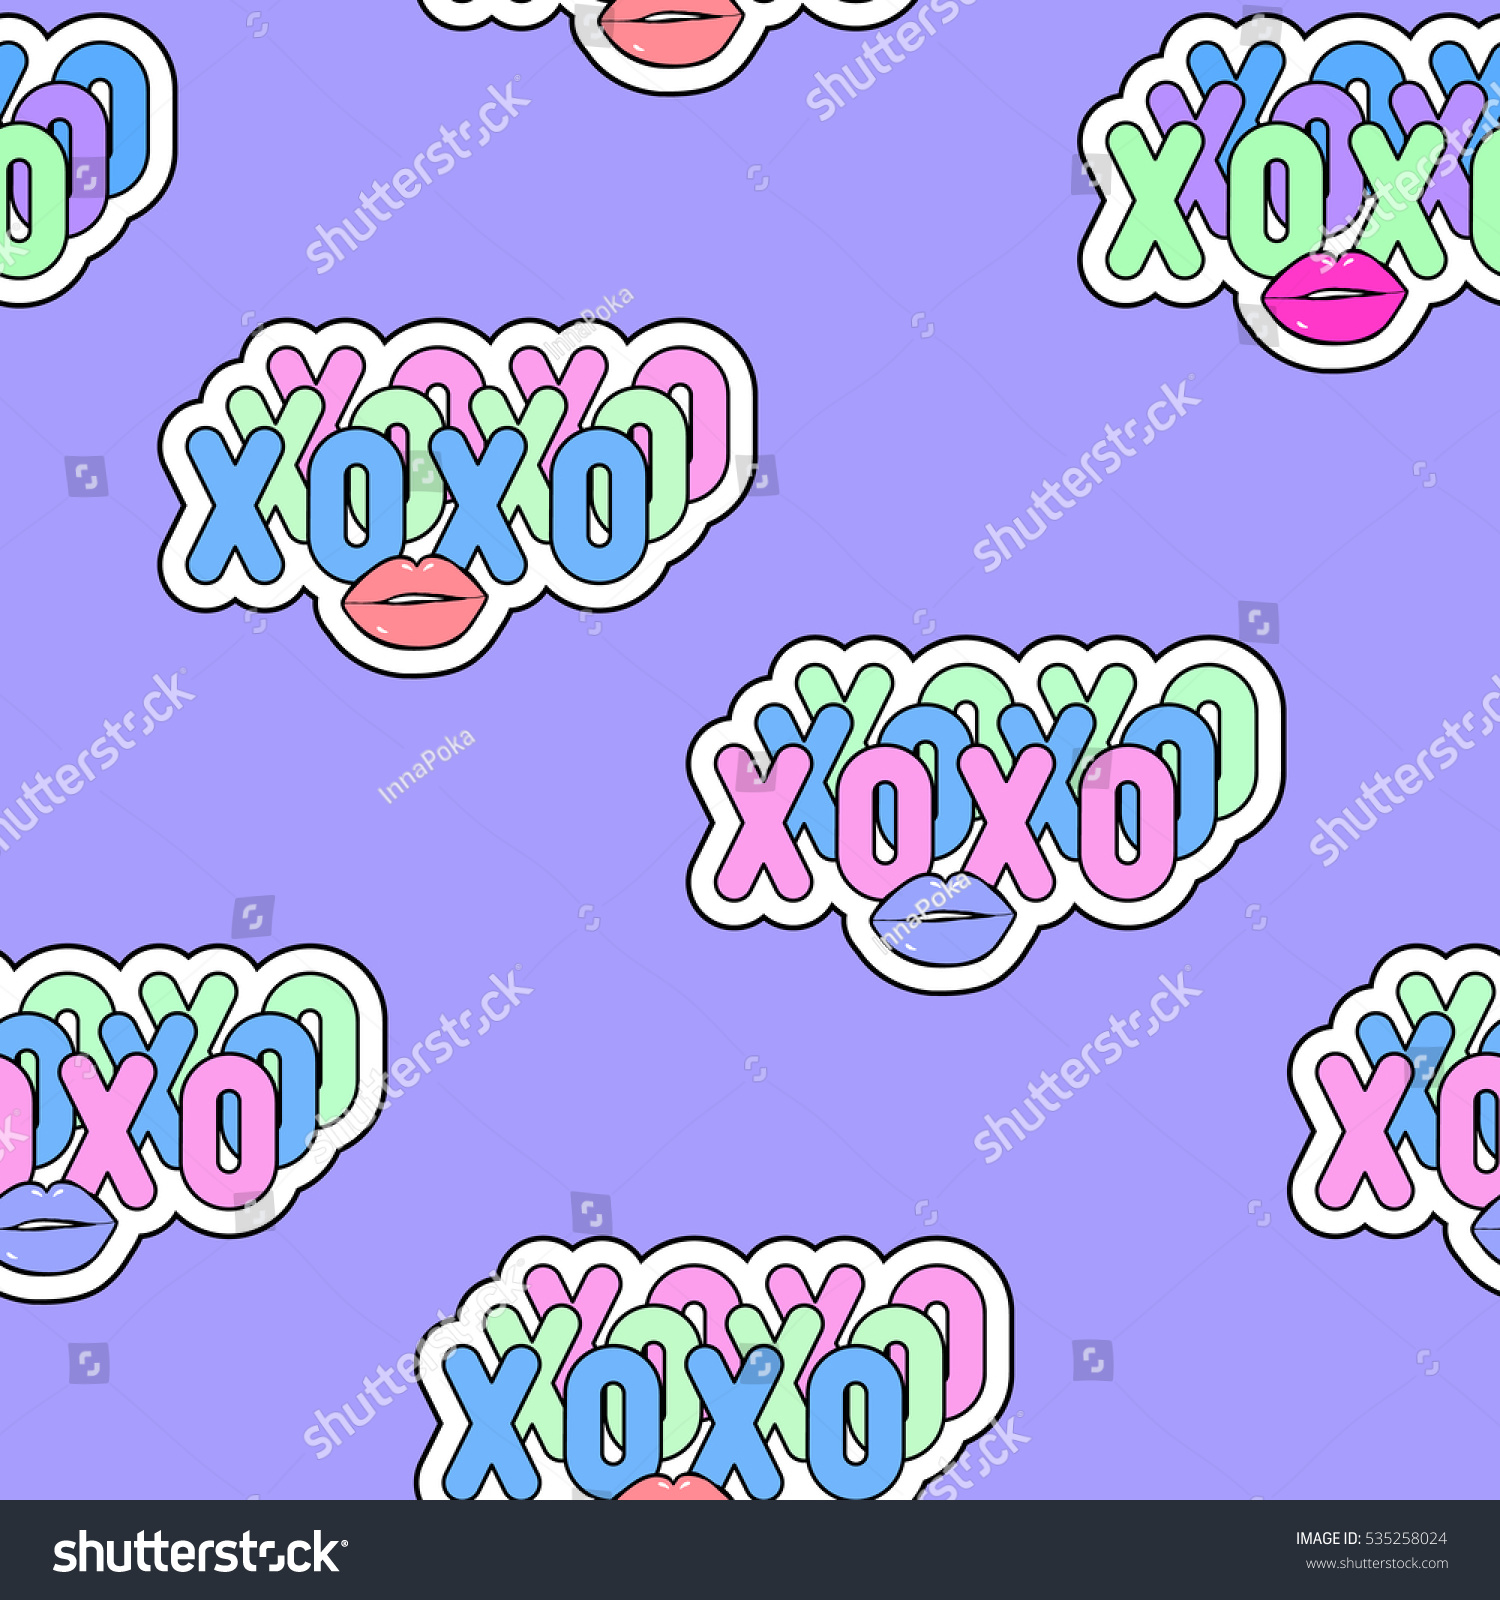 Seamless Pattern Xoxo Abbreviation Text Kiss Stock Vector 535258024